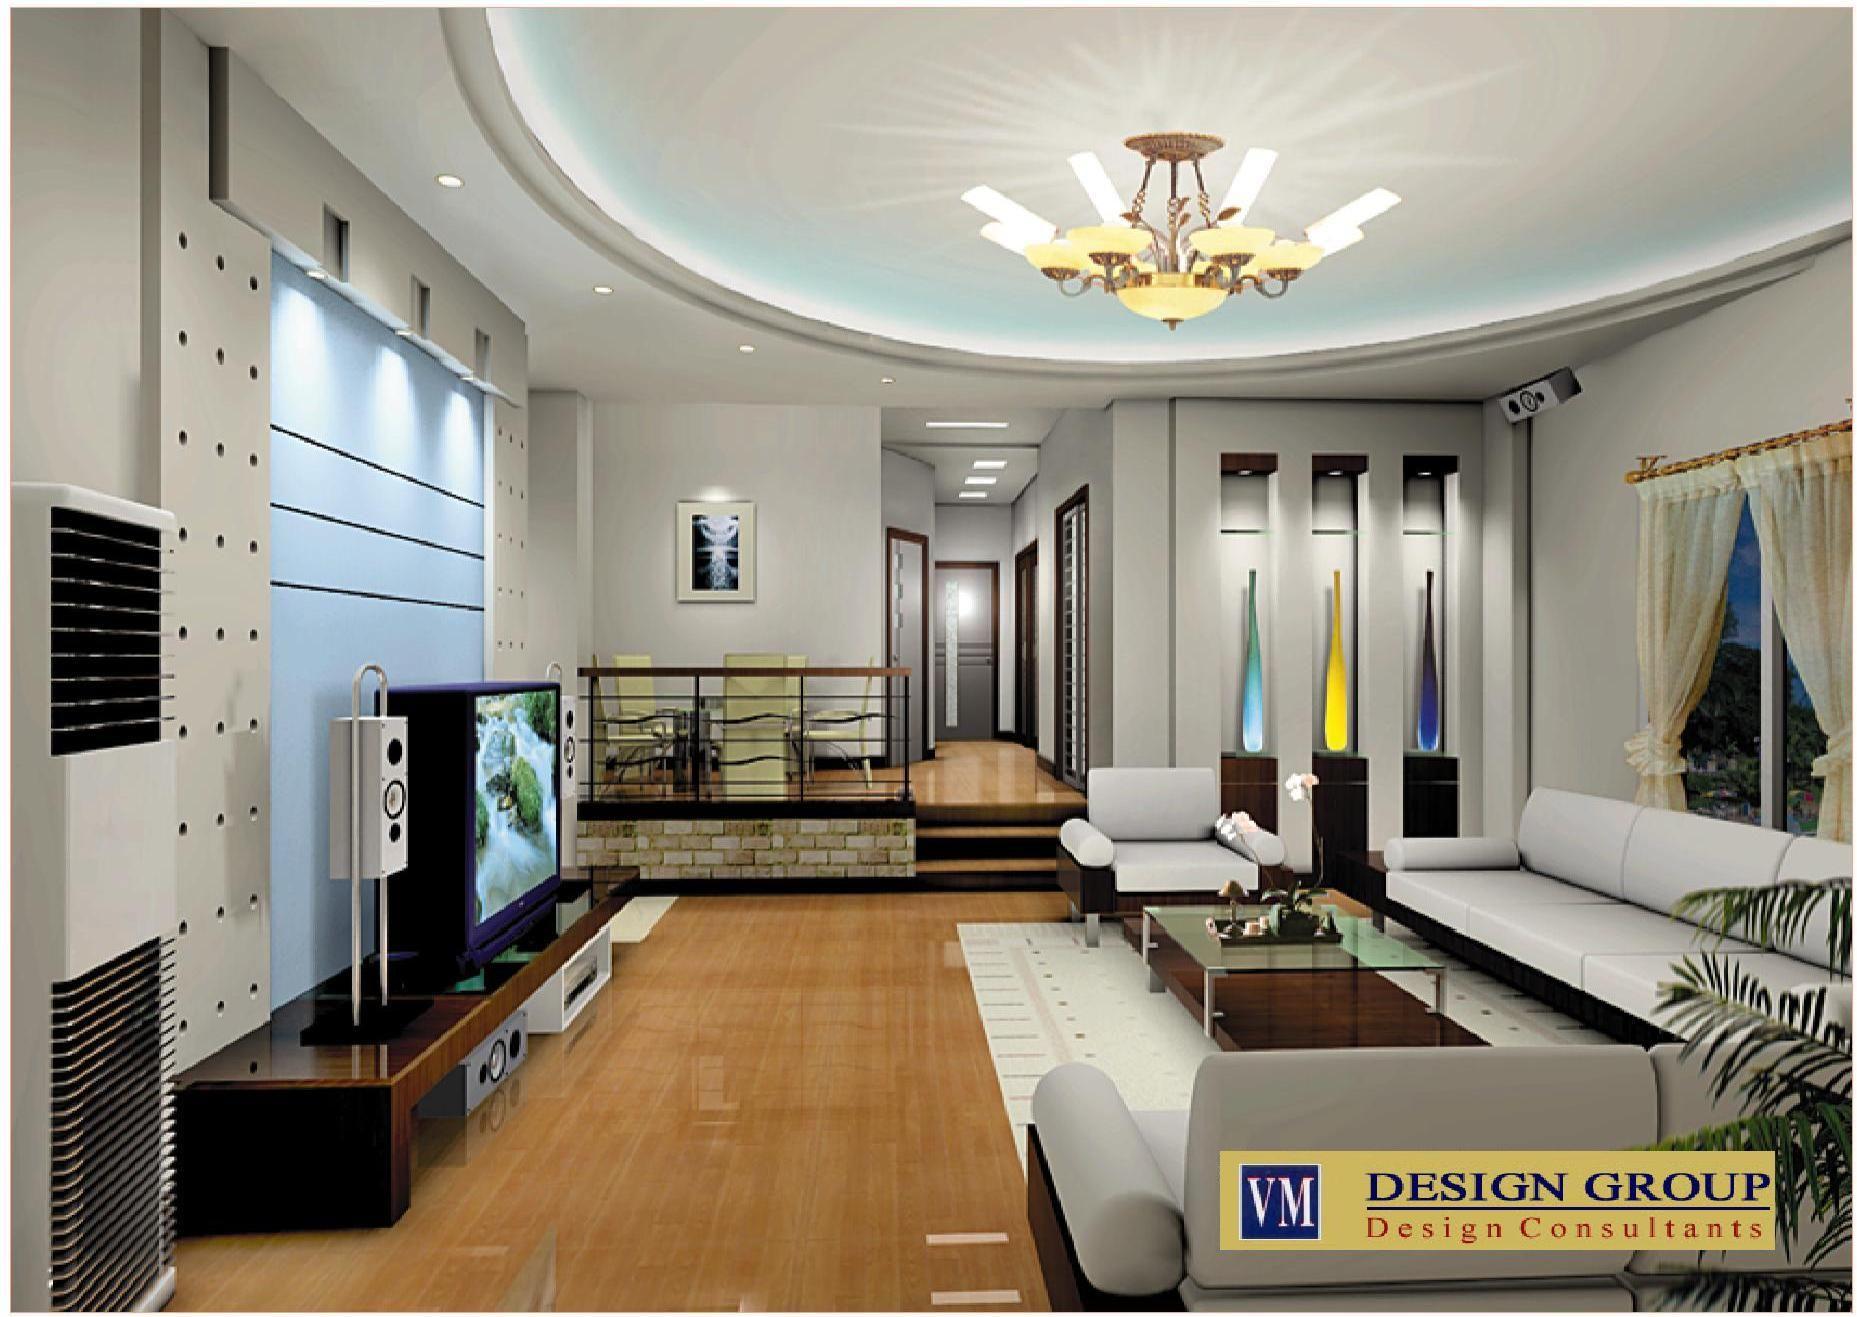 Home Interior Design Ideas Consider Them Thoroughly And House Interior Design Pictures Home Interior Design Interior Design Shows